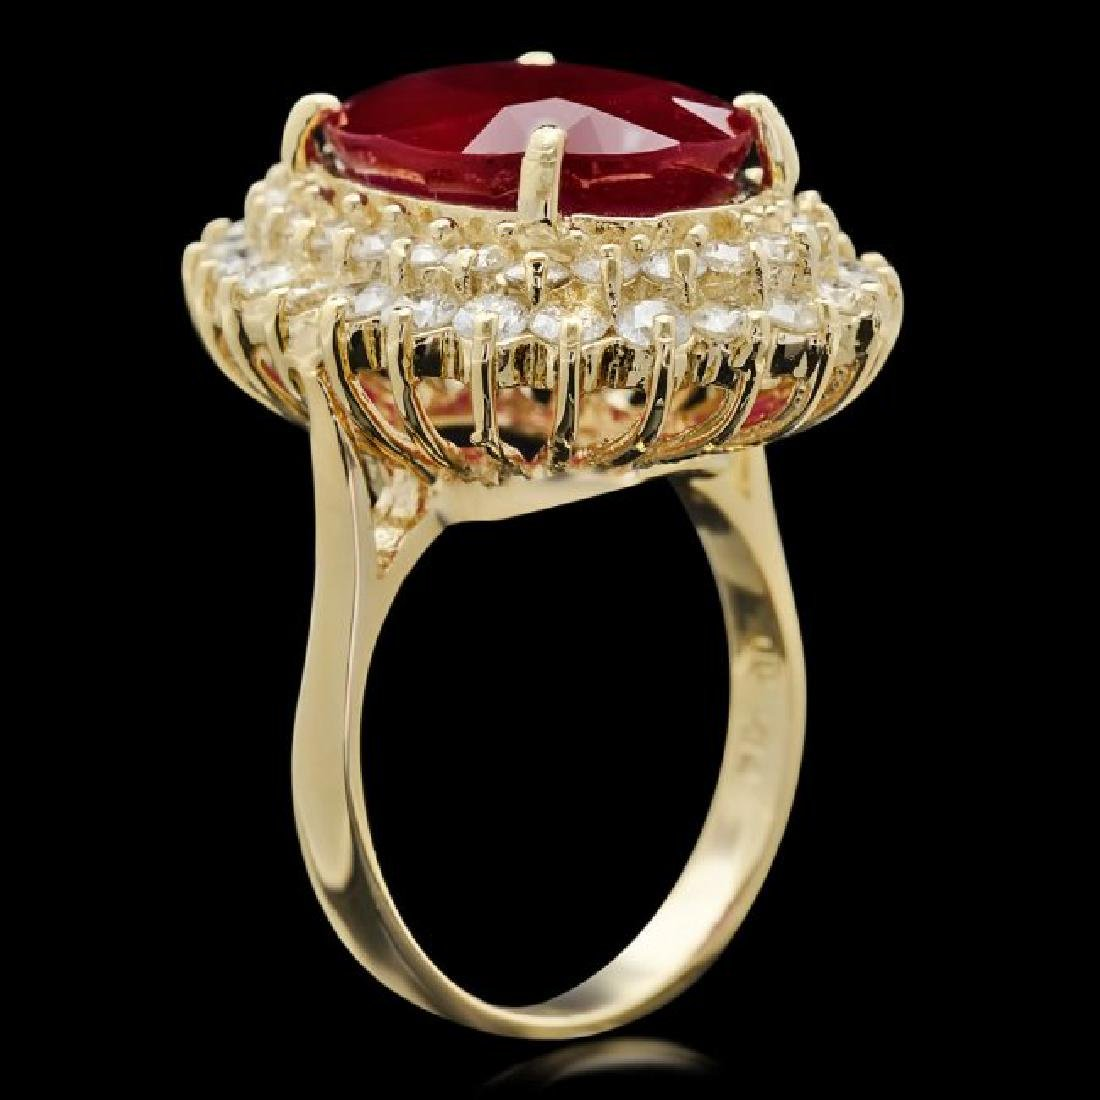 14k Yellow Gold 10.00ct Ruby 2.10ct Diamond Ring - 3